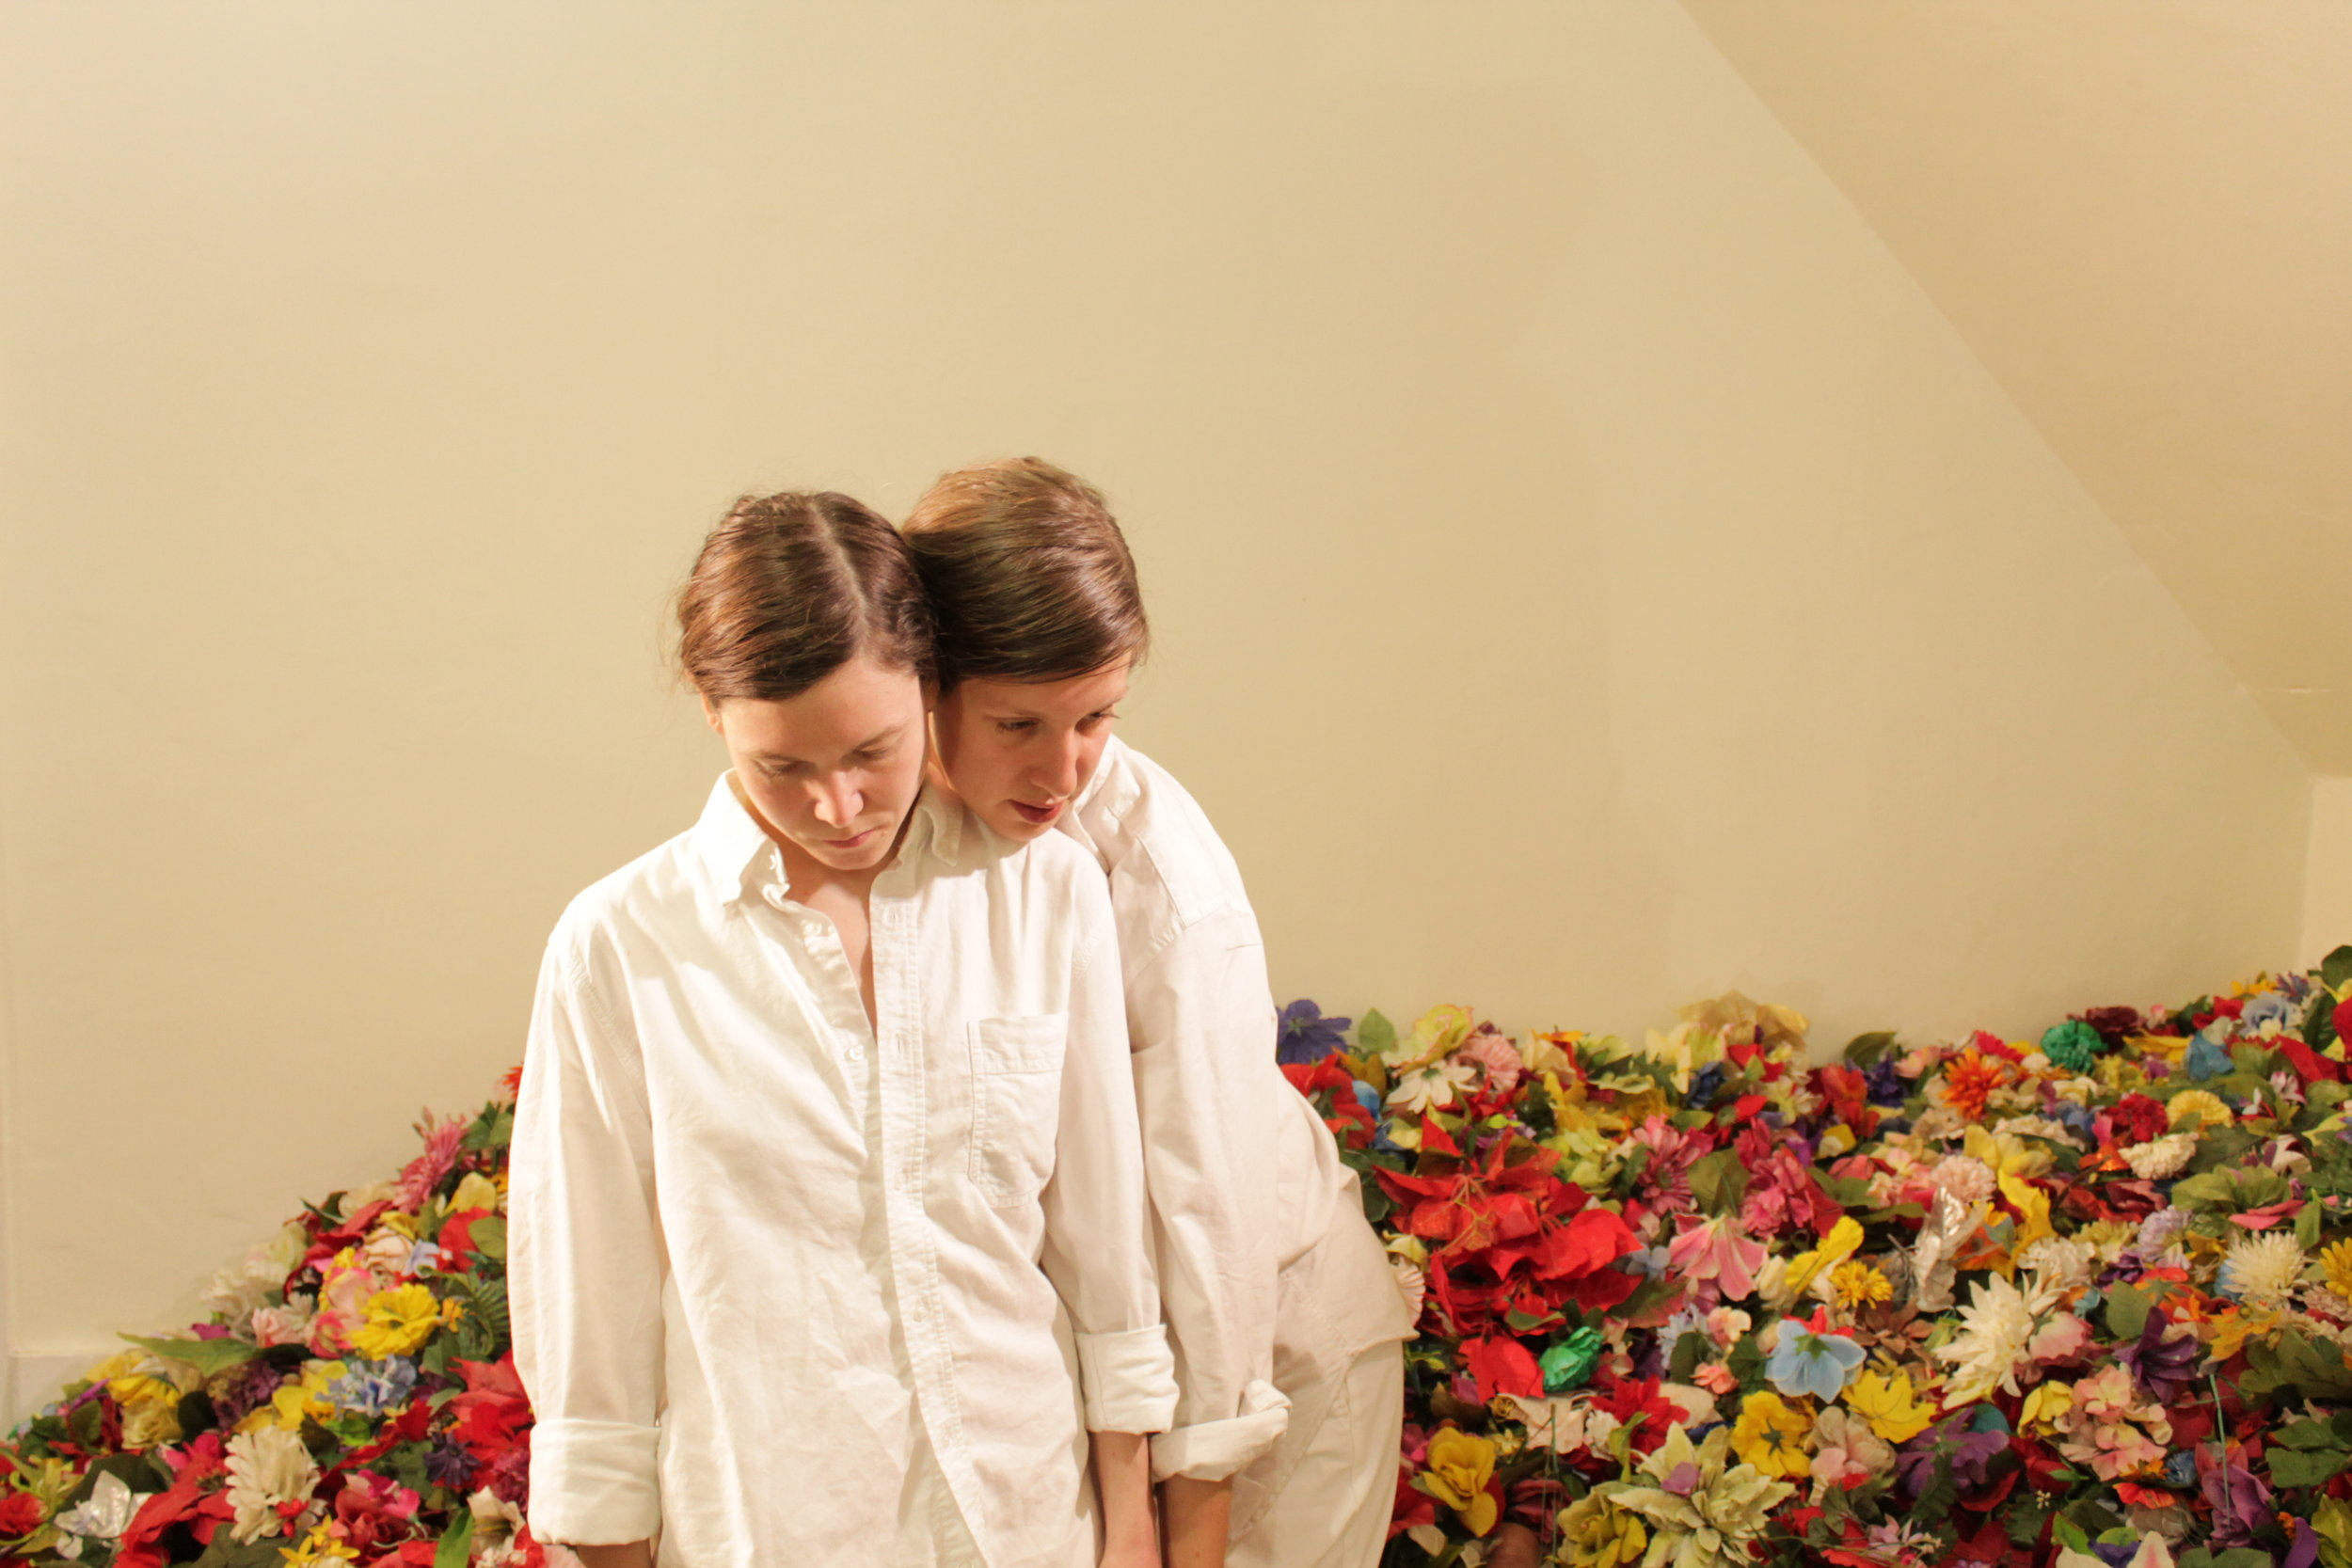 A_E flowers.JPG